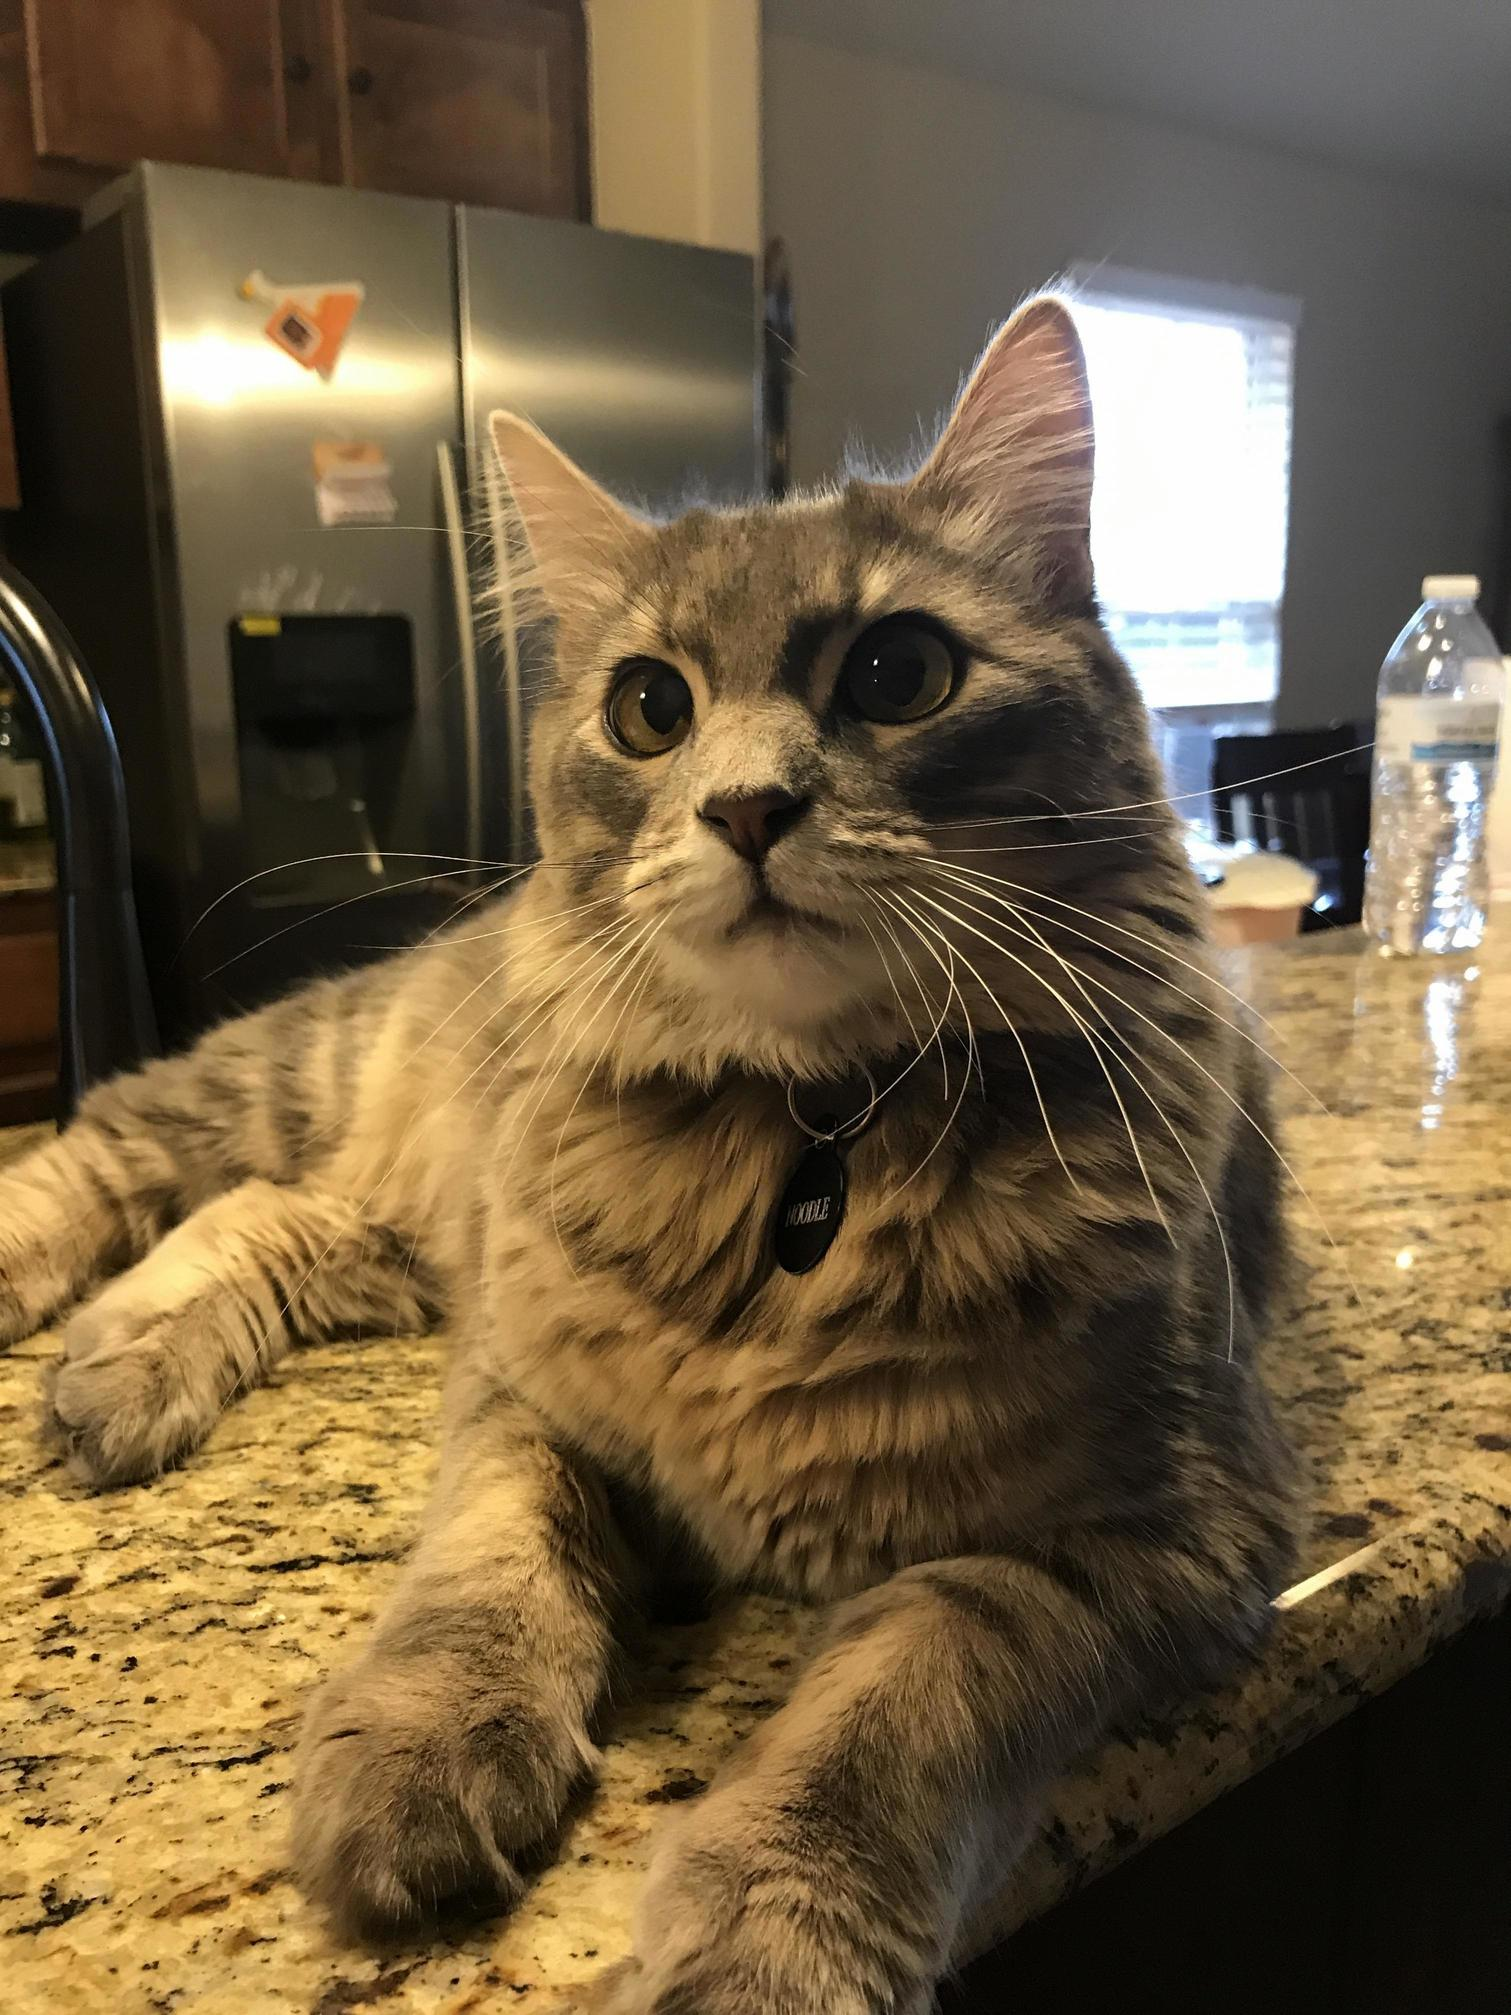 My cat noodle says hi